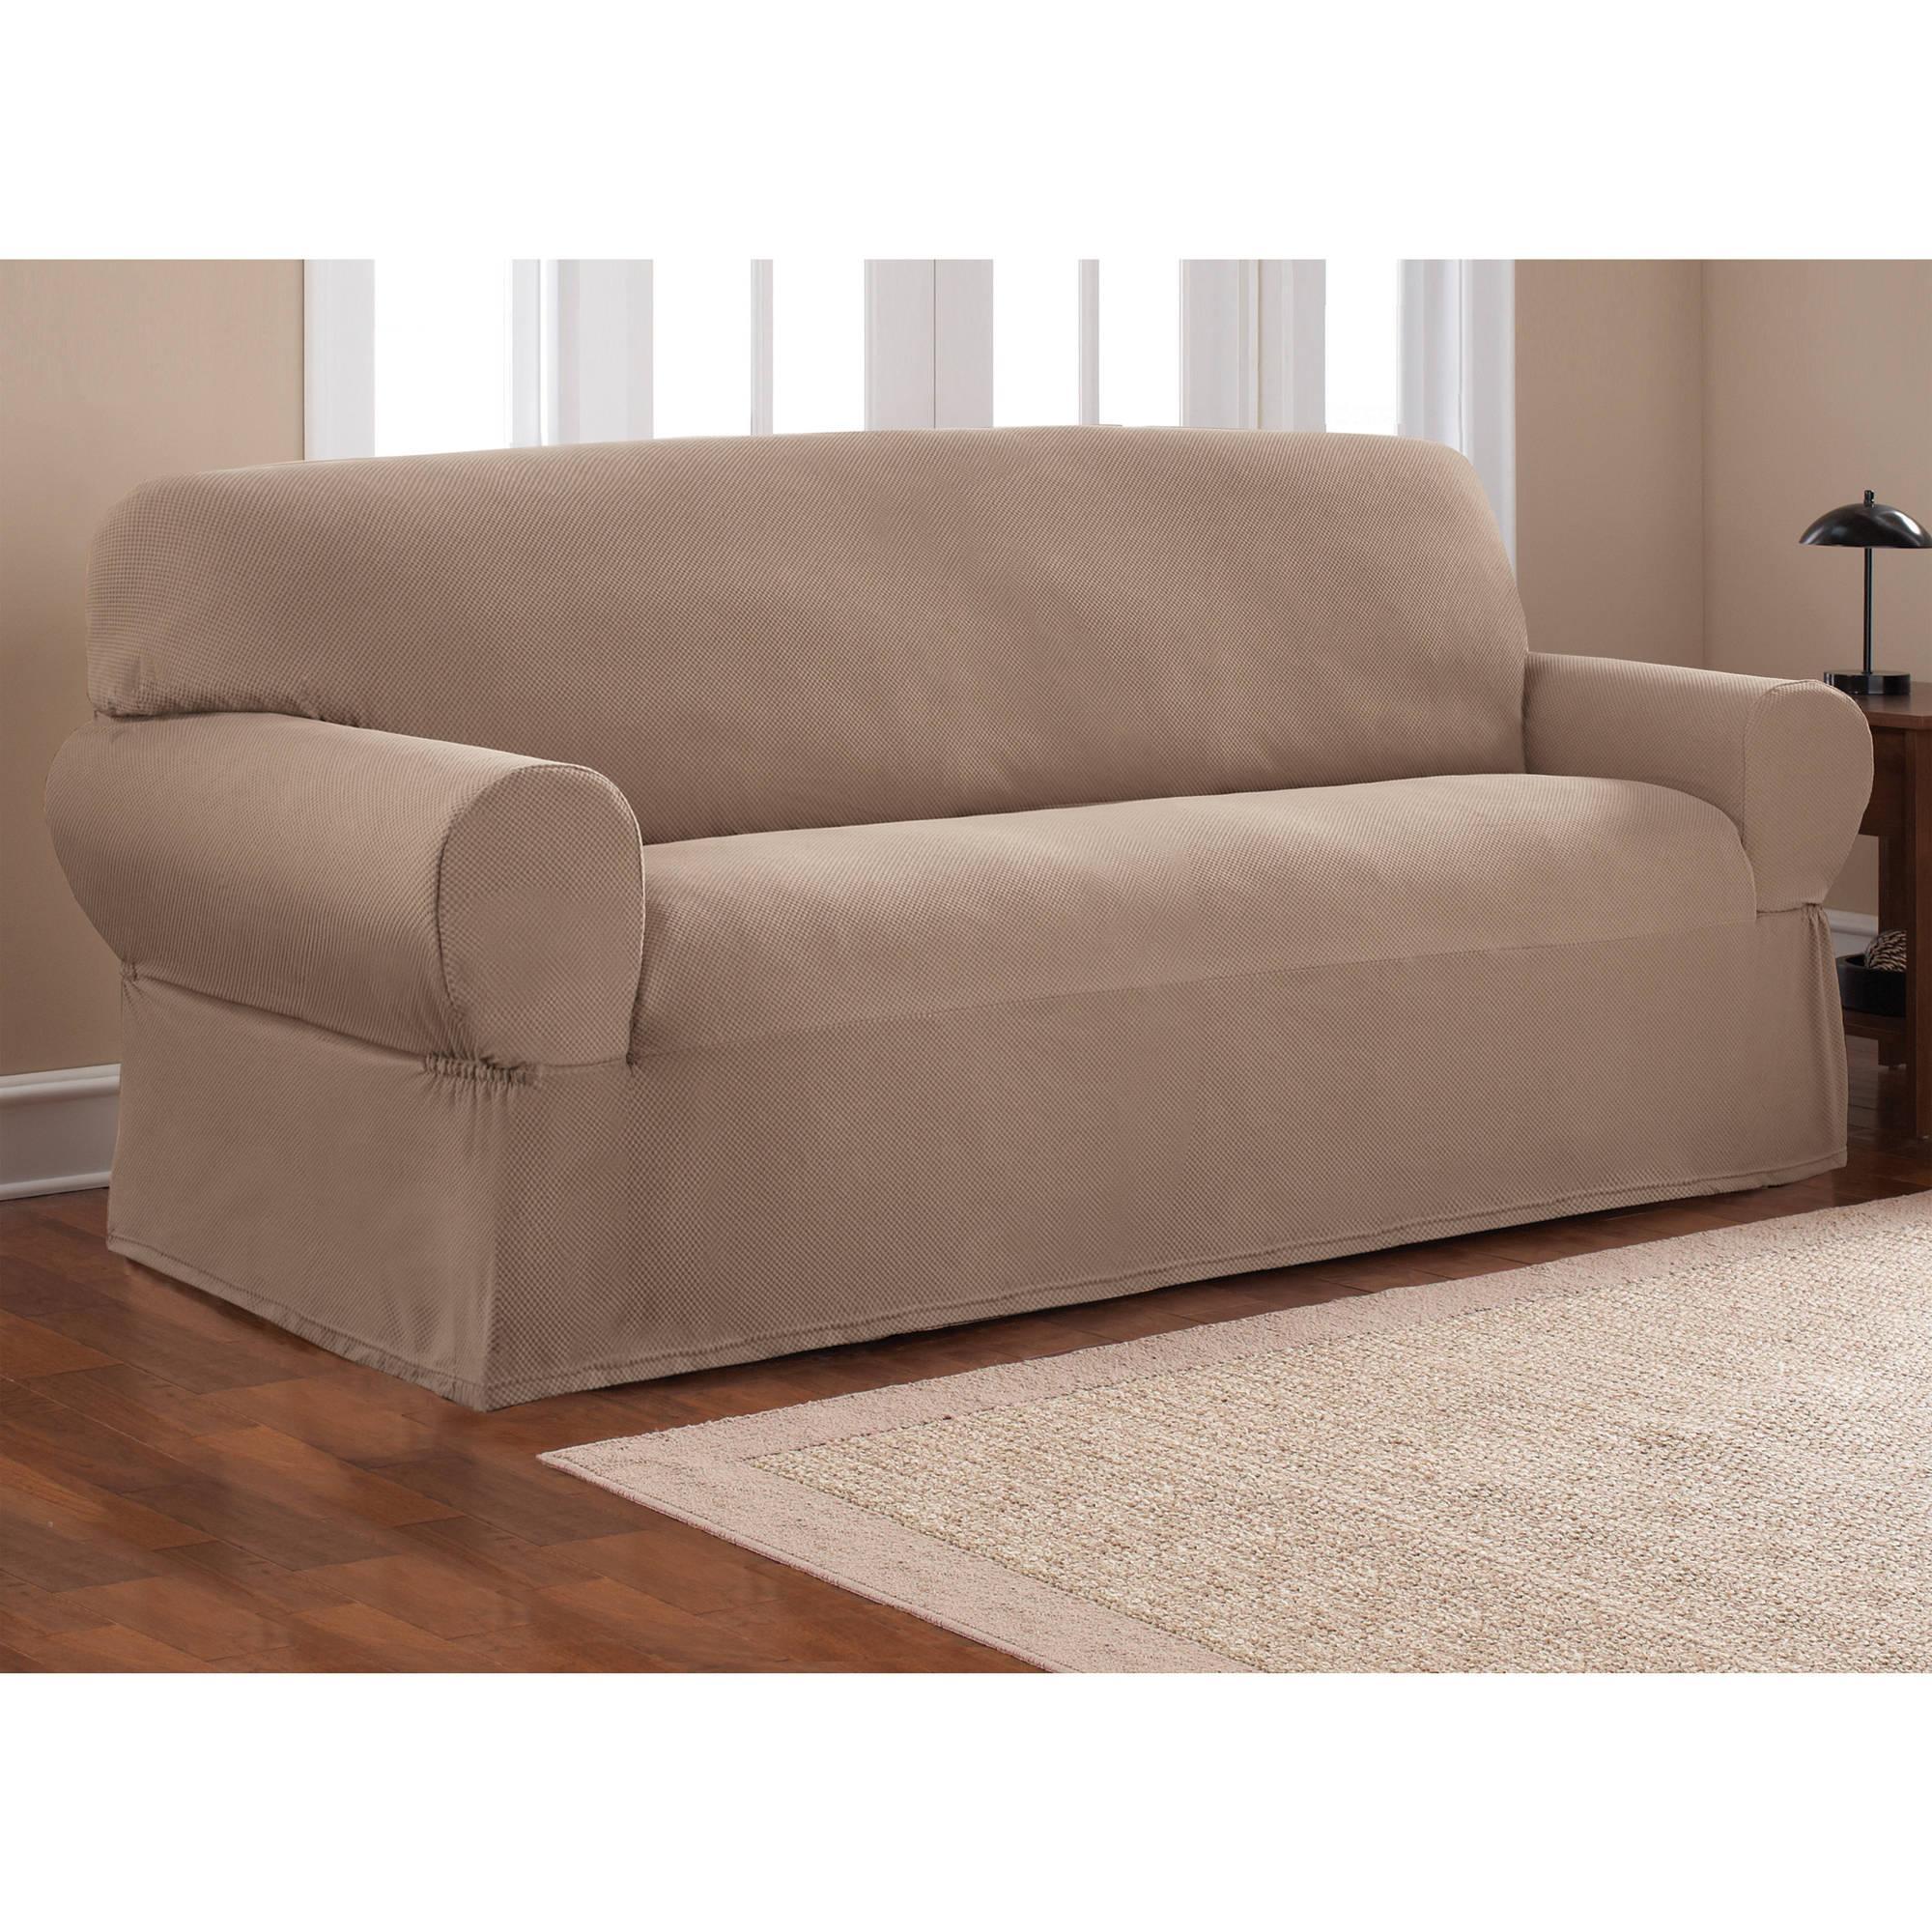 Sofas Center : Ac298C285Ac298C285Ac298C285Ac296O Sofa Wonderful Within Slipcover For Reclining Sofas (Image 16 of 20)